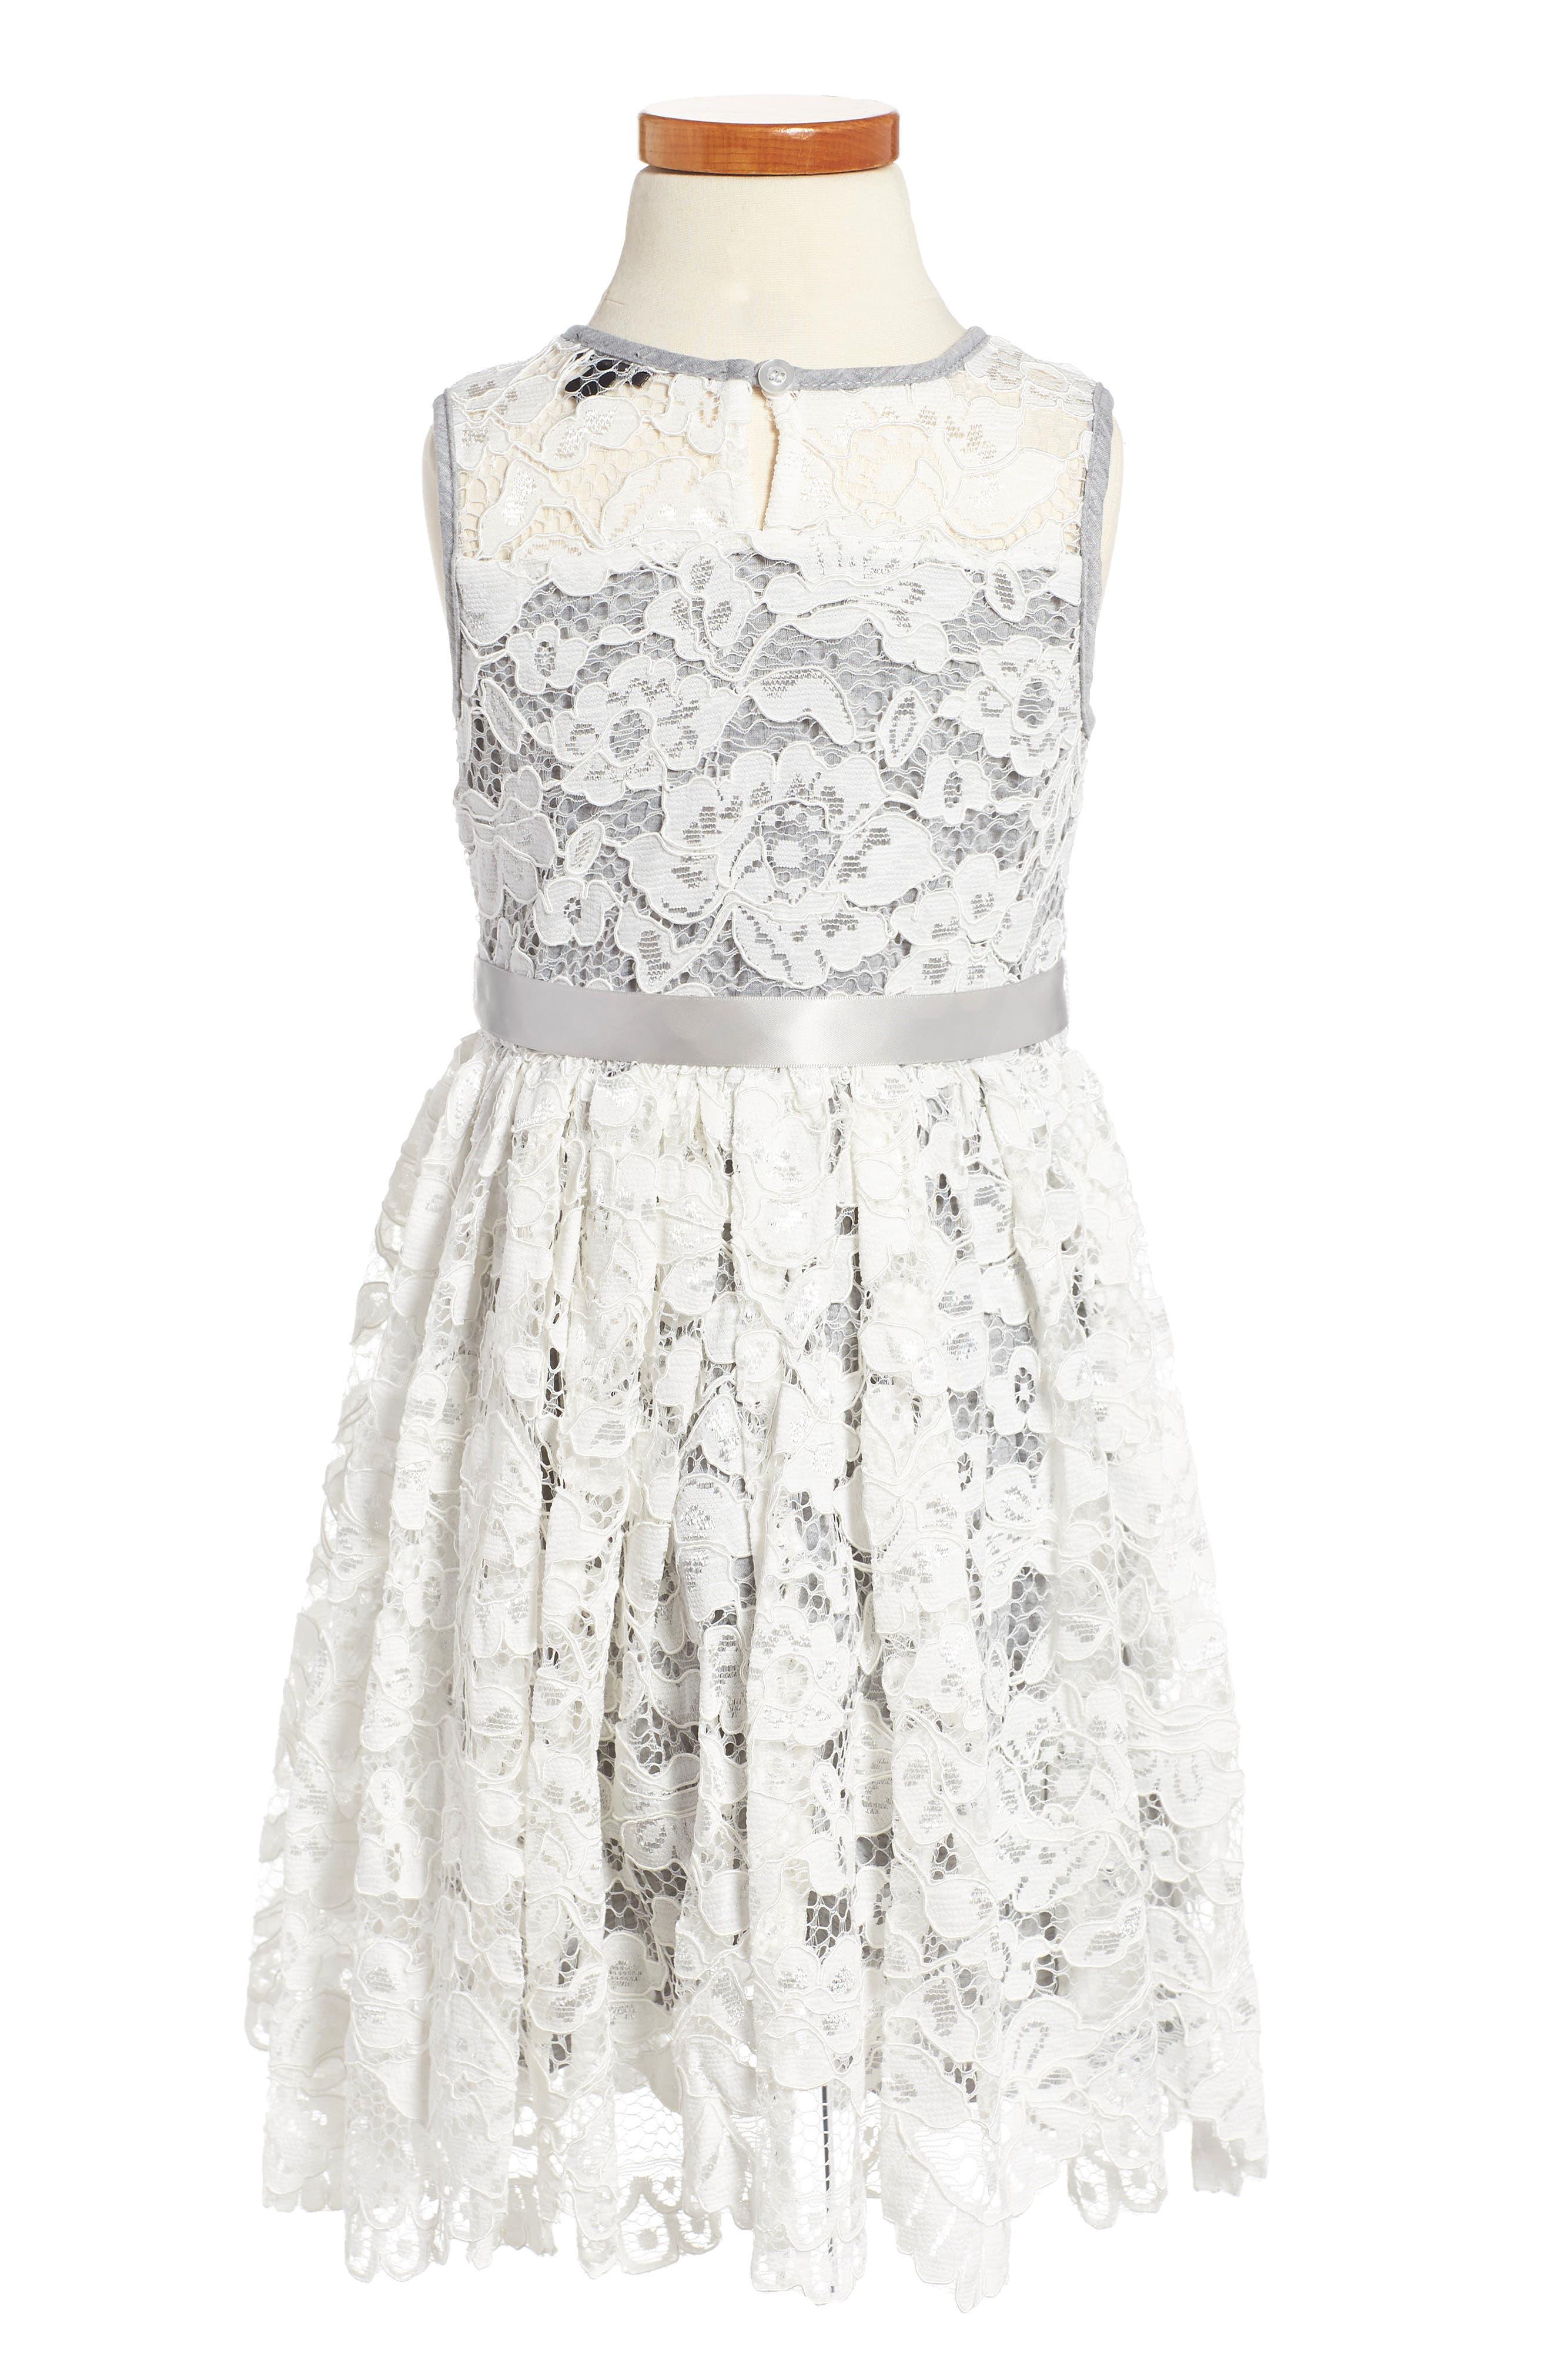 Scalloped Floral Lace Dress,                         Main,                         color, 904